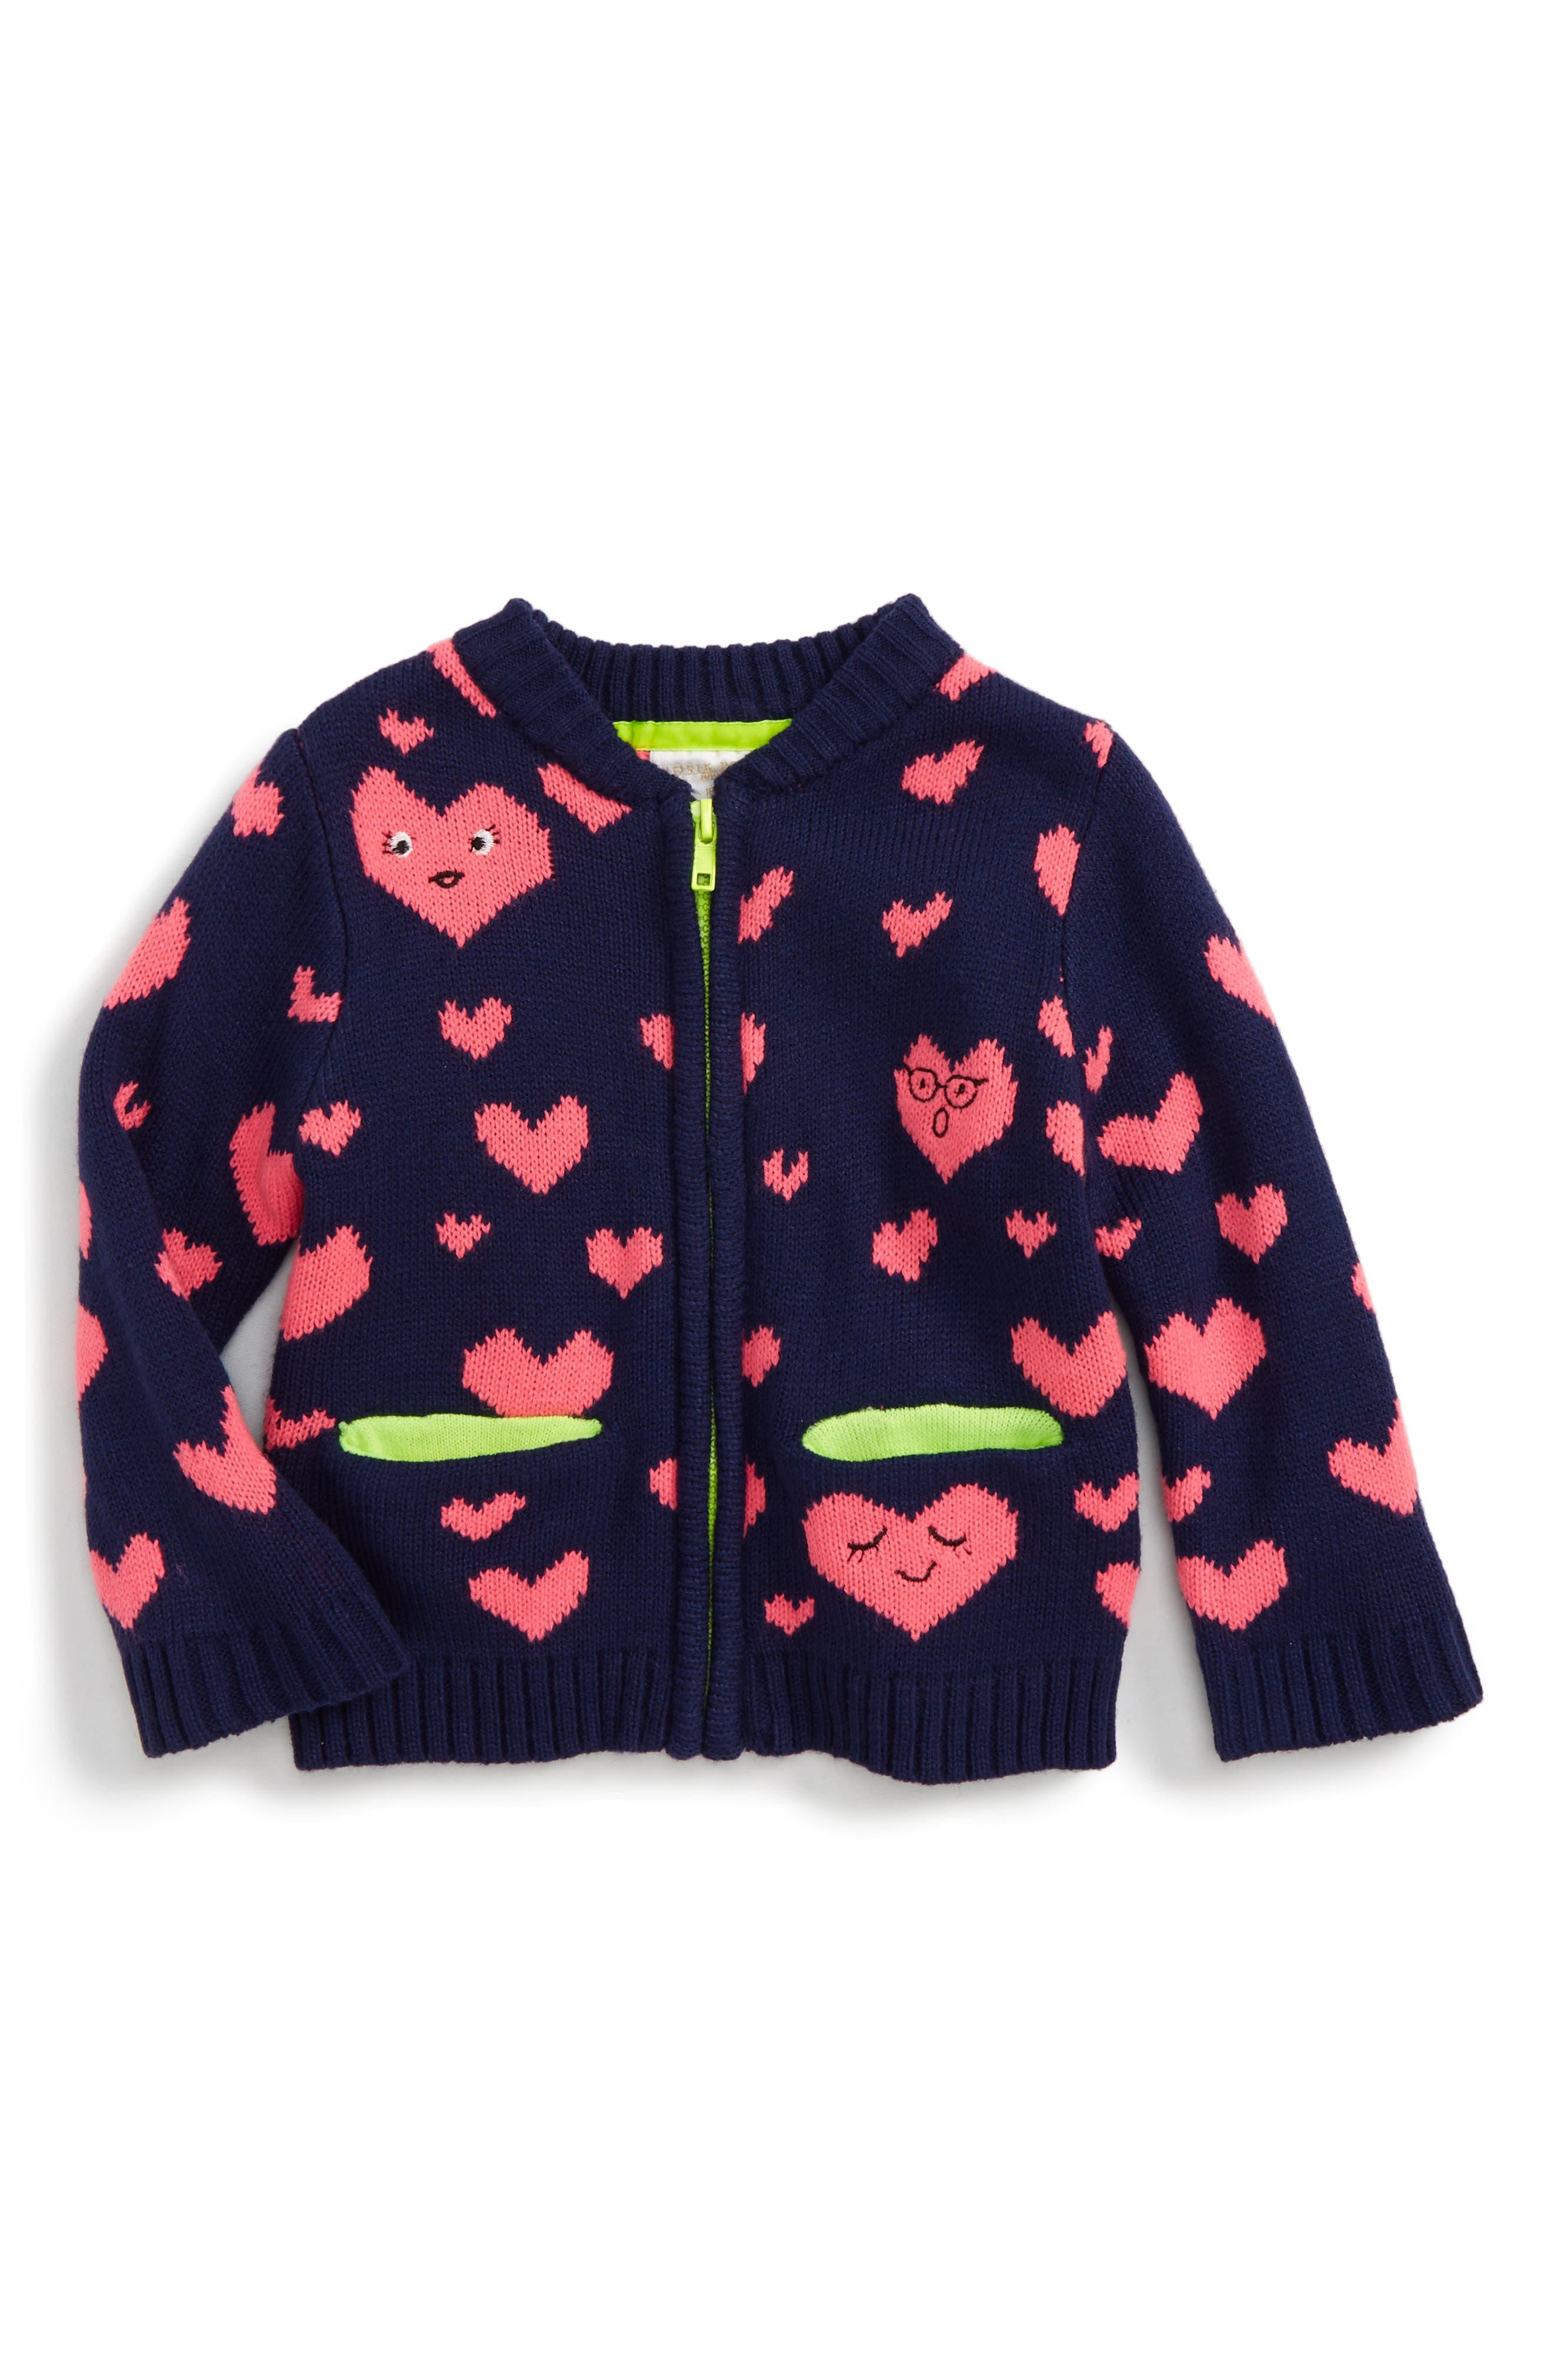 ROSIE POPE Heart Zip Up Cardigan